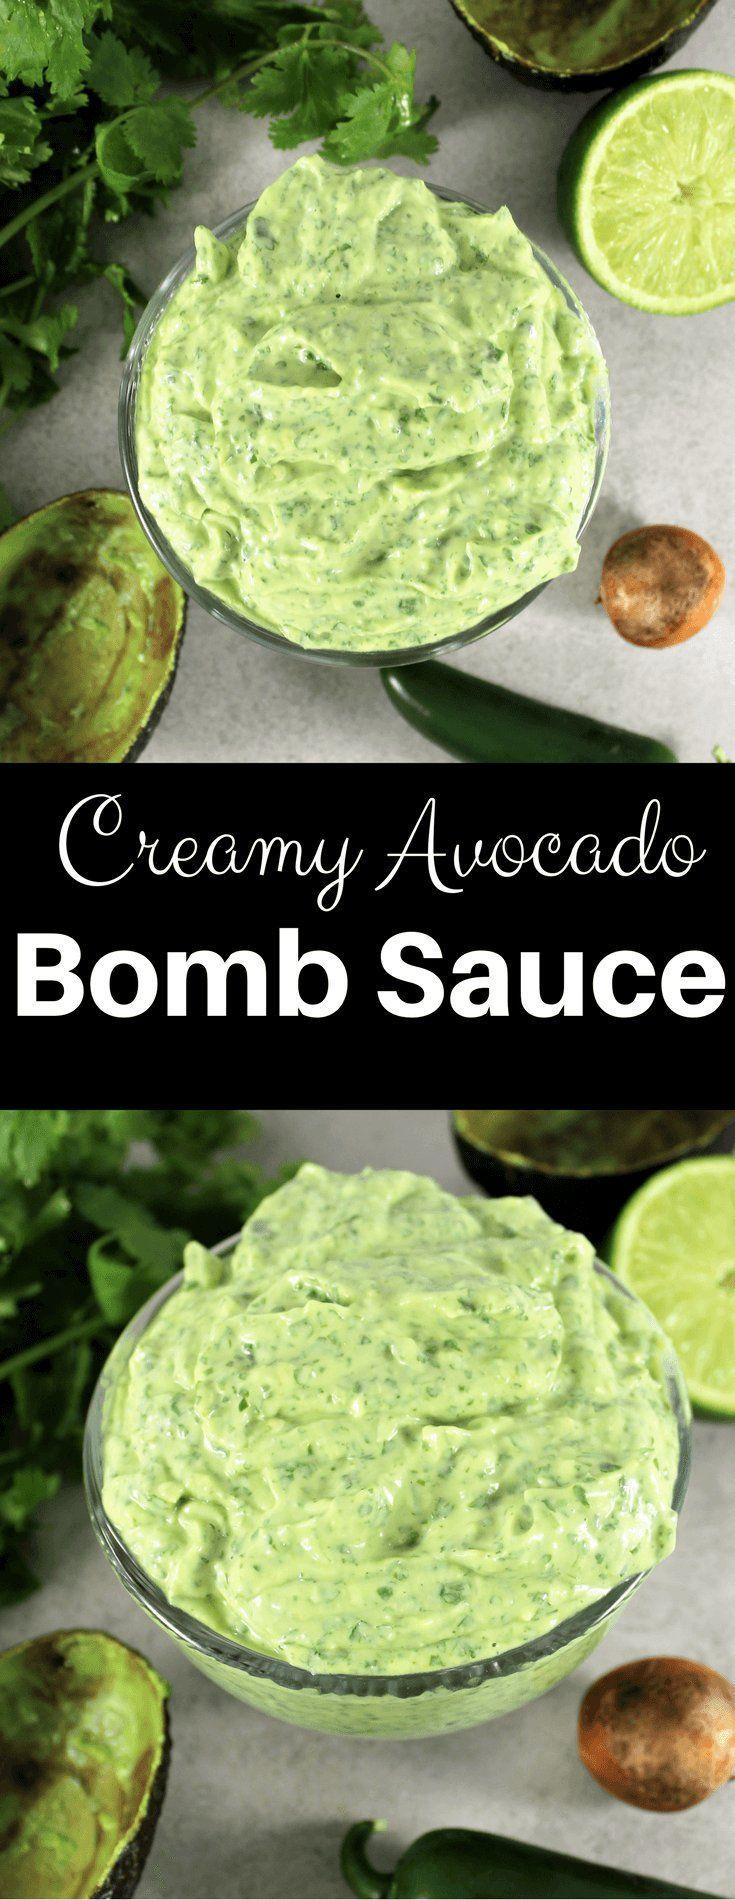 Creamy Avocado Bomb Sauce | The avocado go to sauce for everything